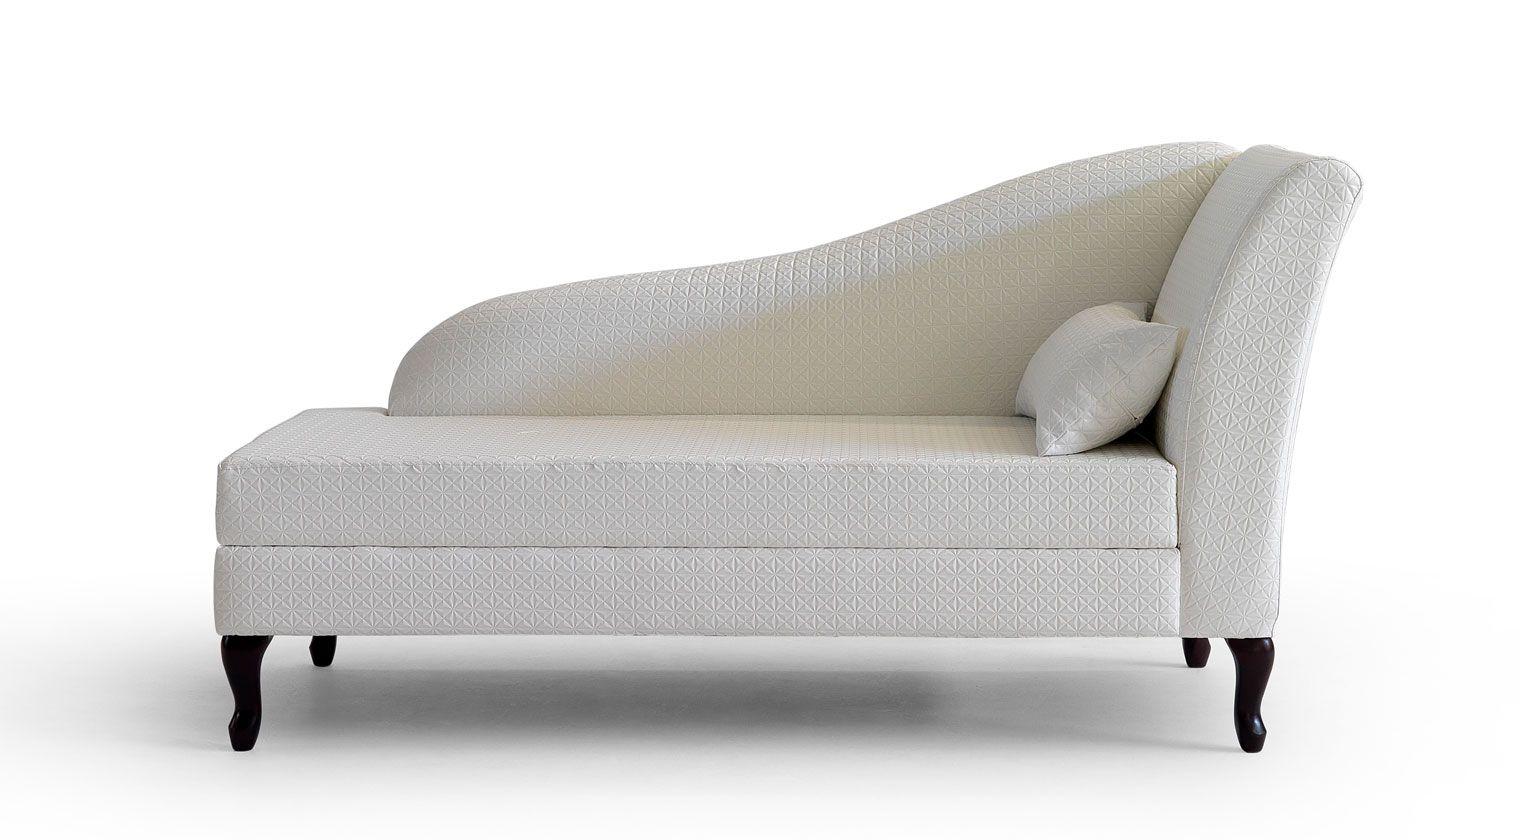 sofas chaise longue baratos madrid for sales comprar butaca diván donna divan microfibra goku